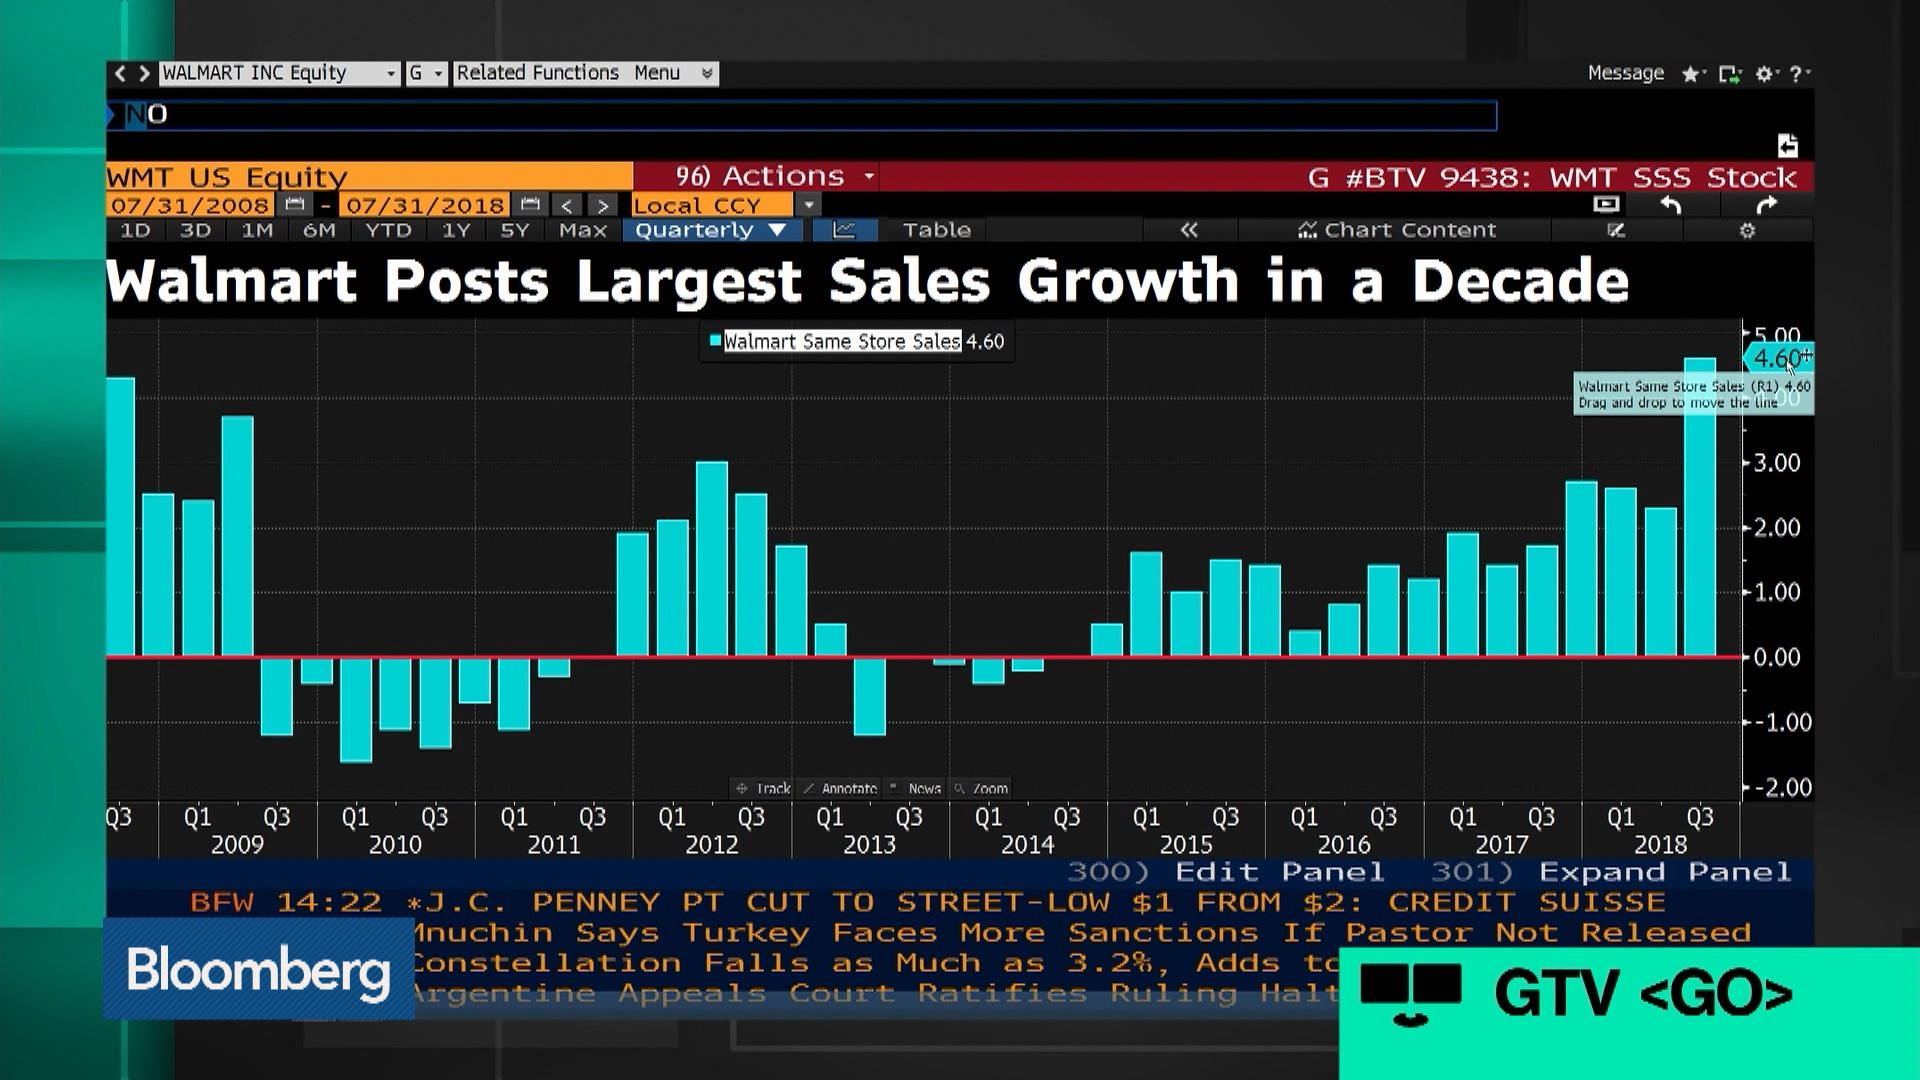 Wmtnew York Stock Quote Walmart Inc Bloomberg Markets